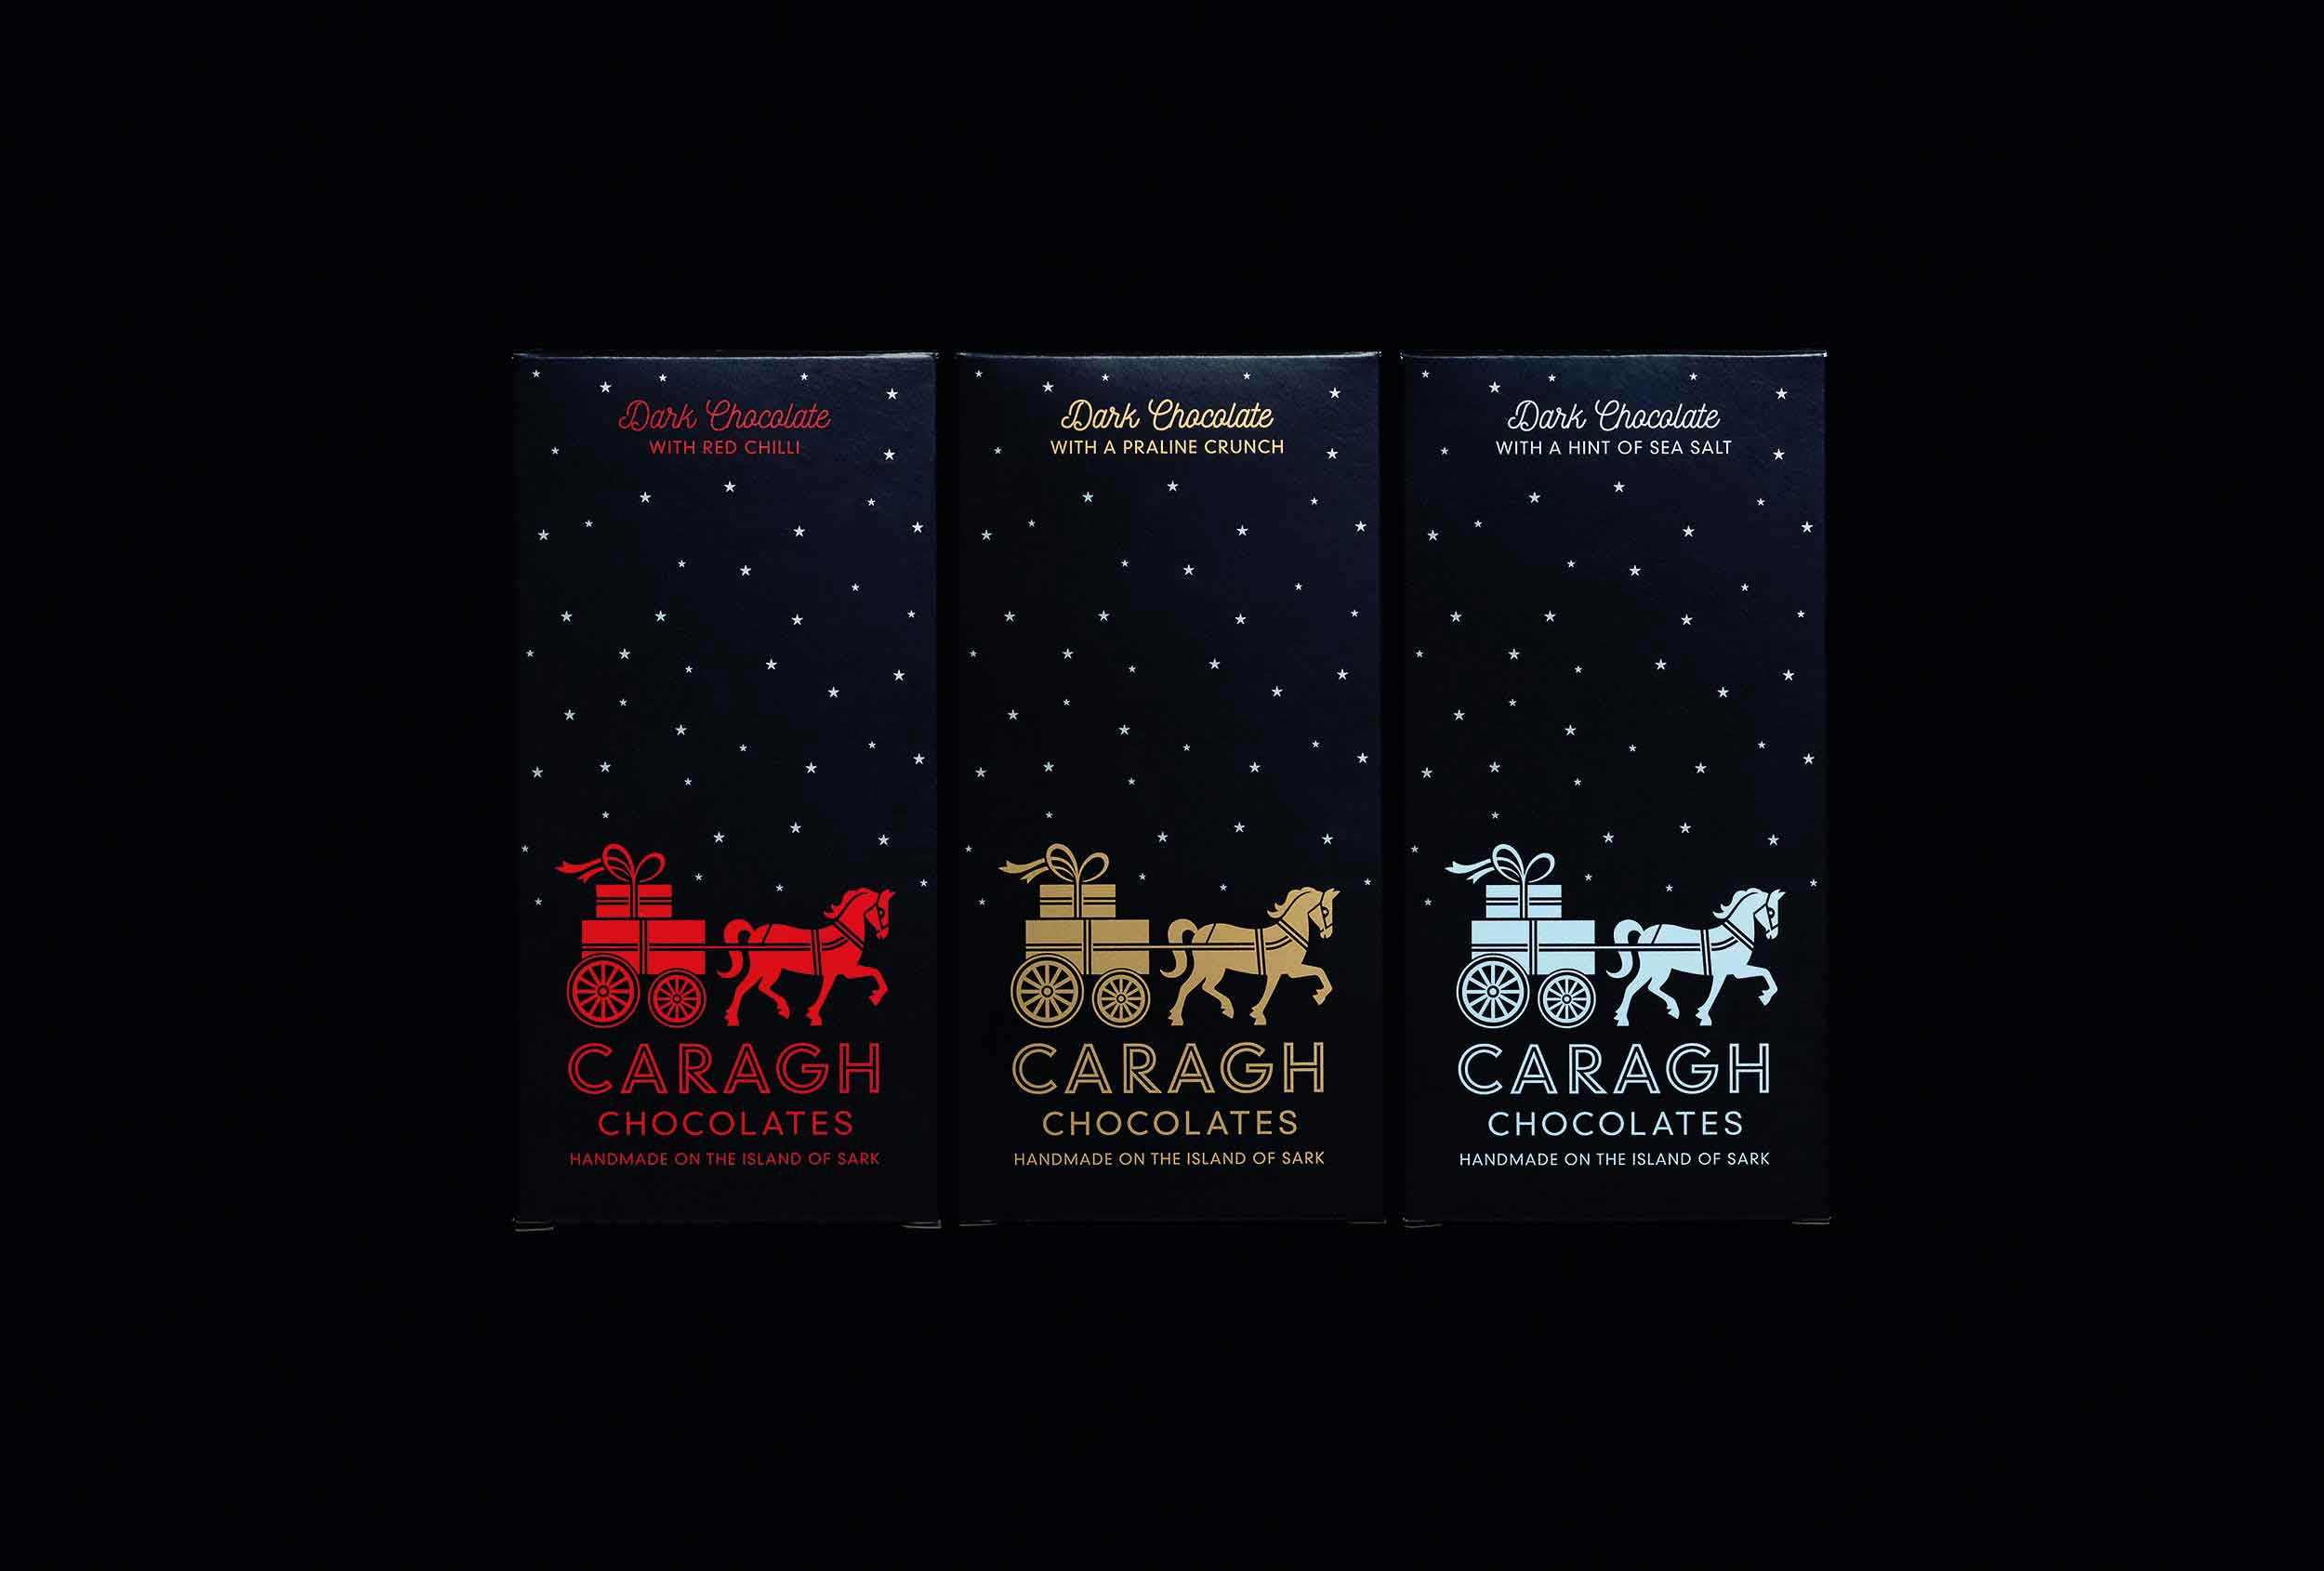 The 'Dark Skies' range designed by Distil Studio.